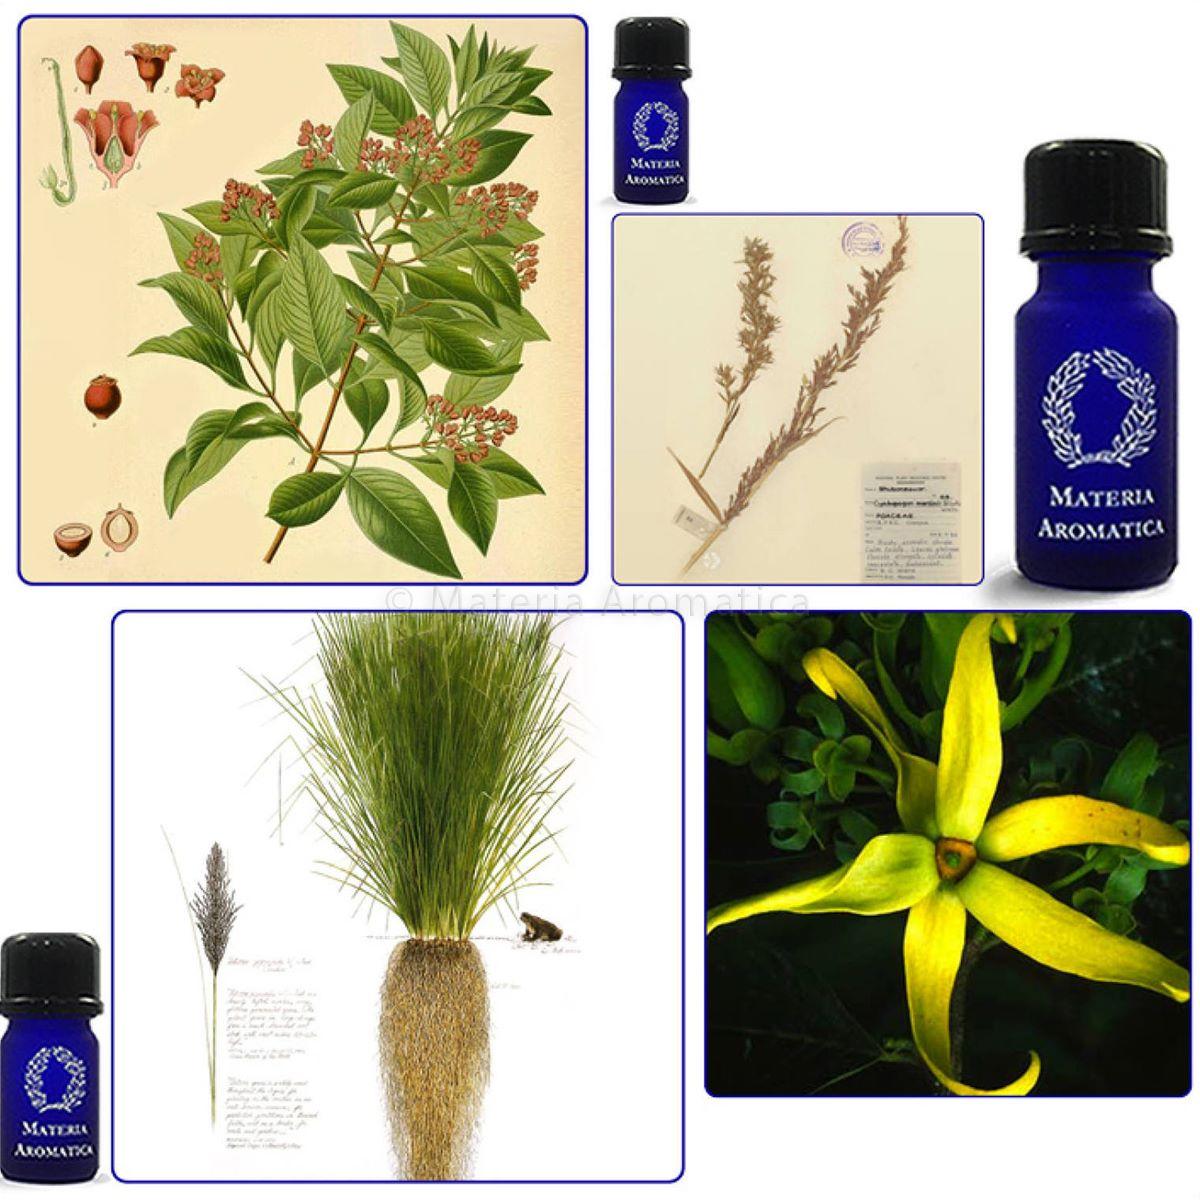 Nourish The Roots Materia Aromatica